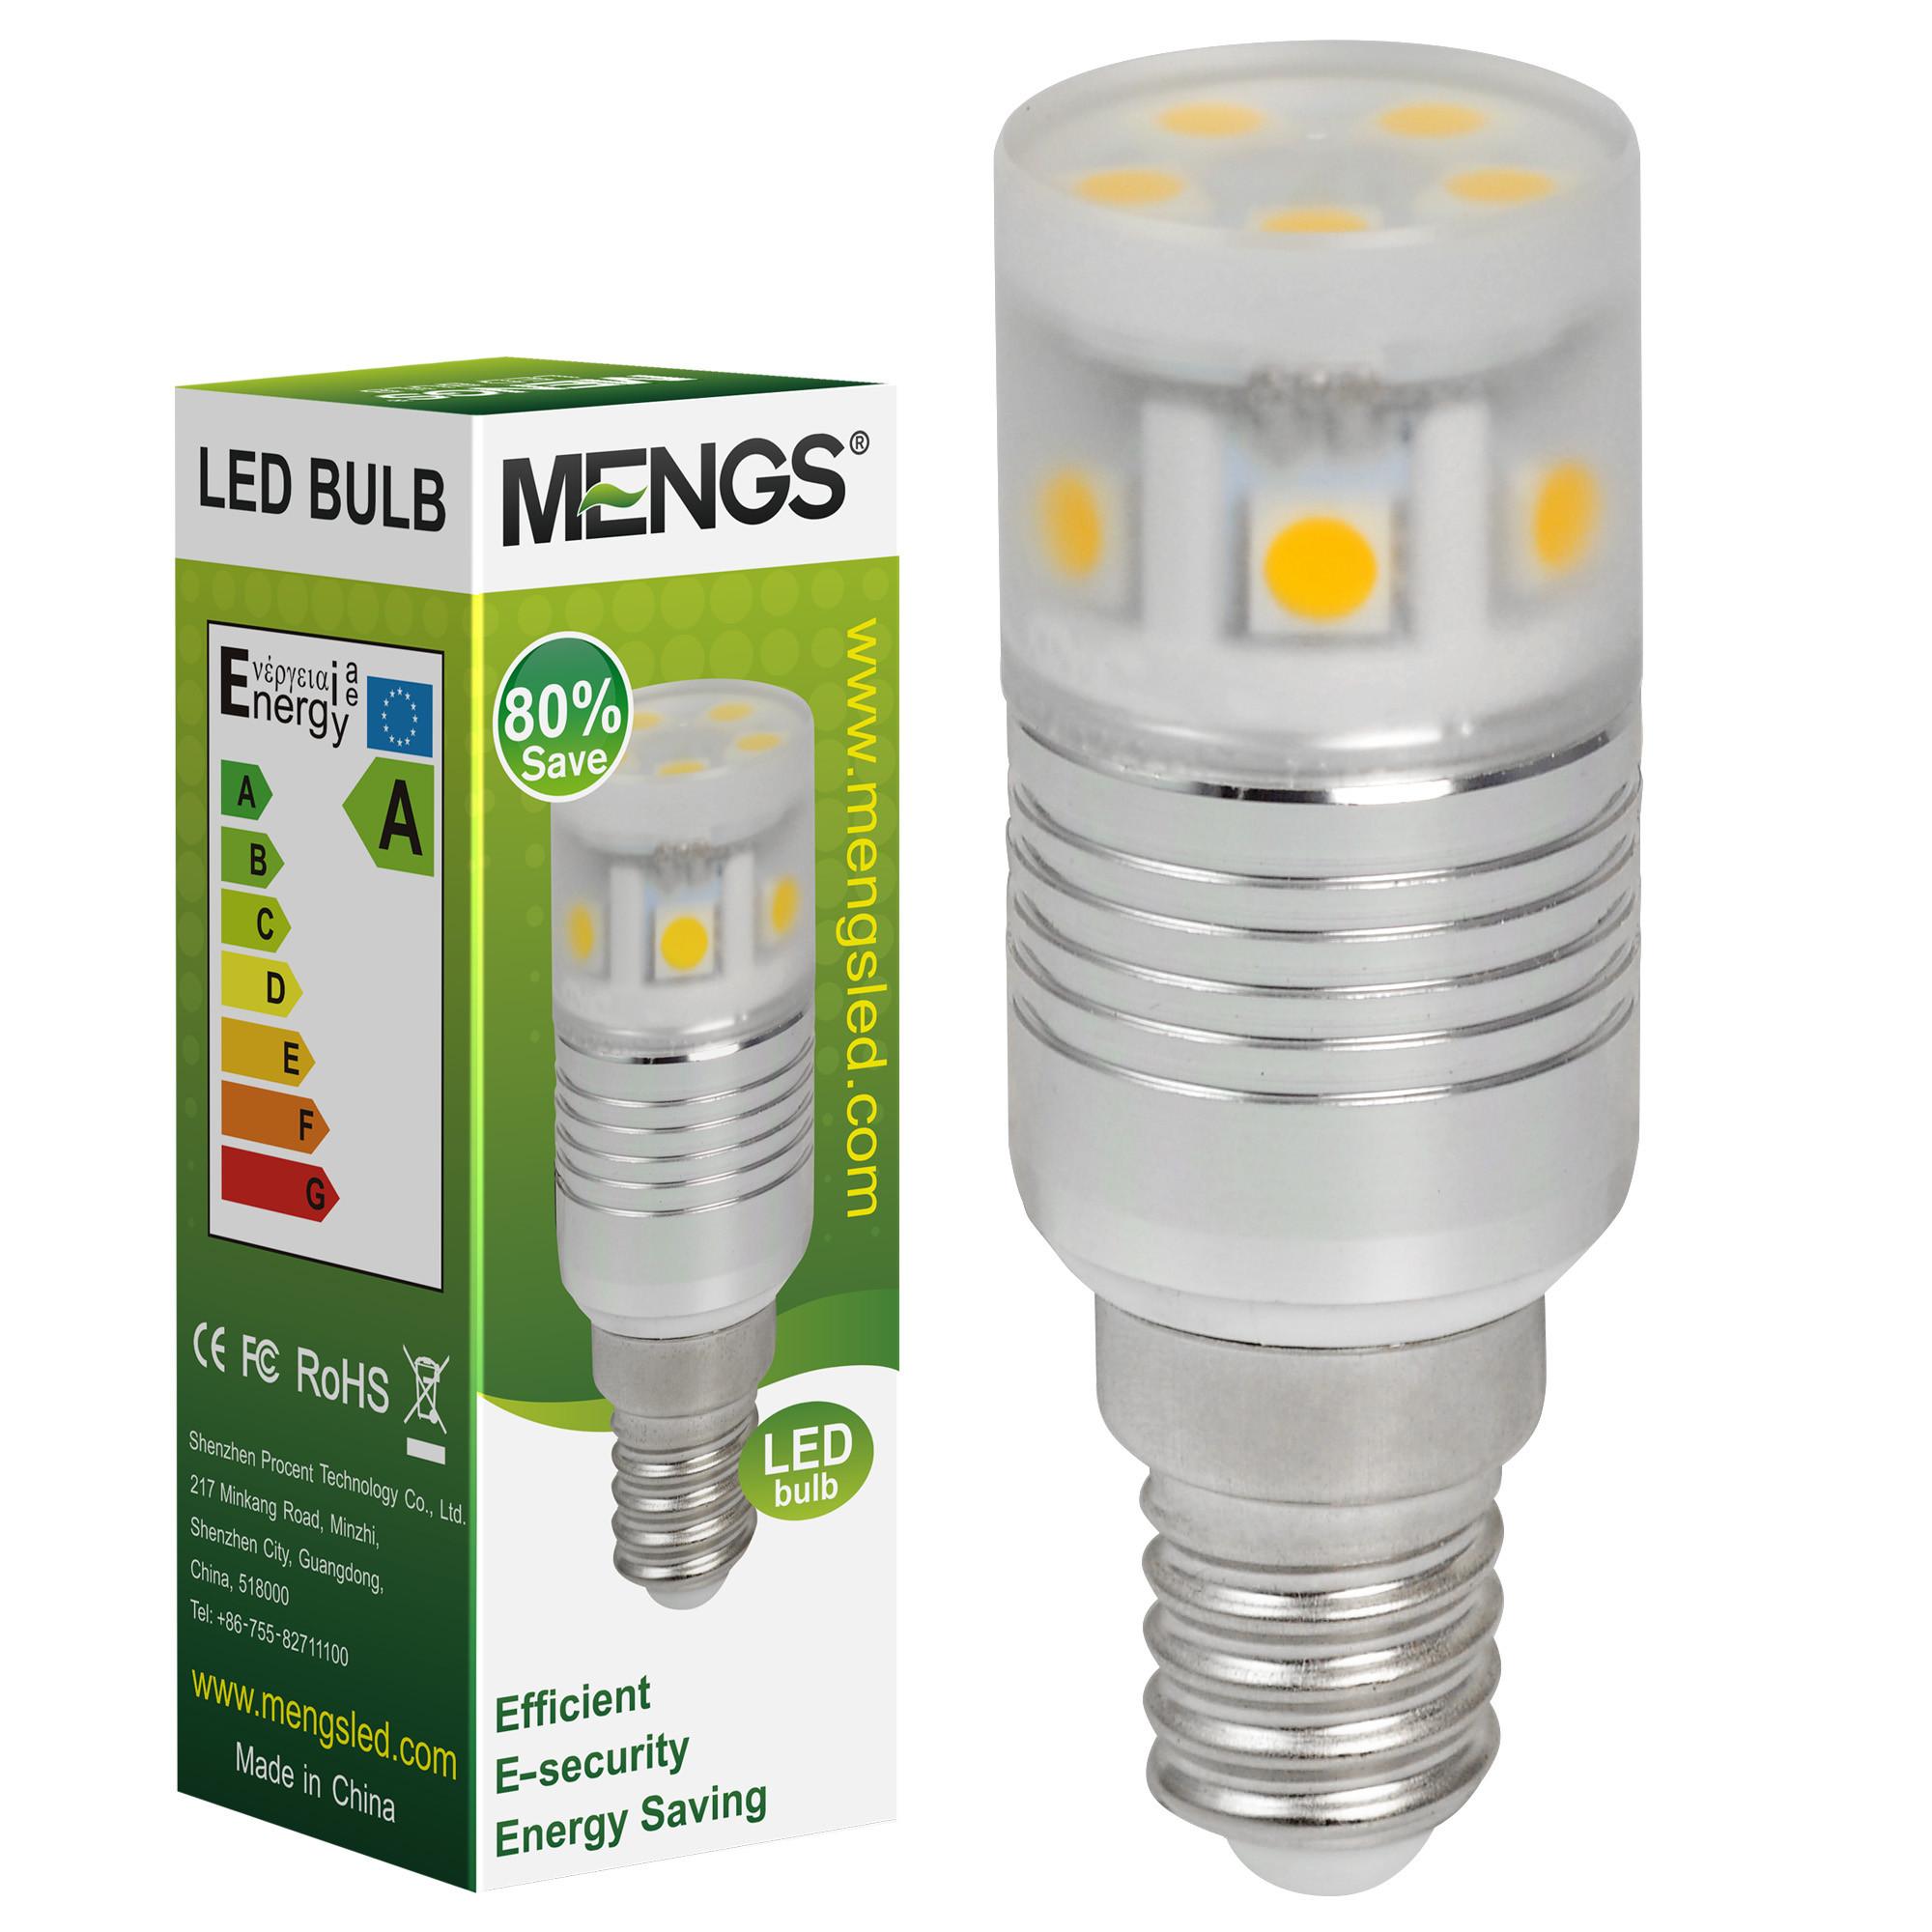 MENGS® E14 2.5W LED Corn Light 11x 5050 SMD LEDs LED Lamp Bulb In Warm White Energy-Saving Lamp